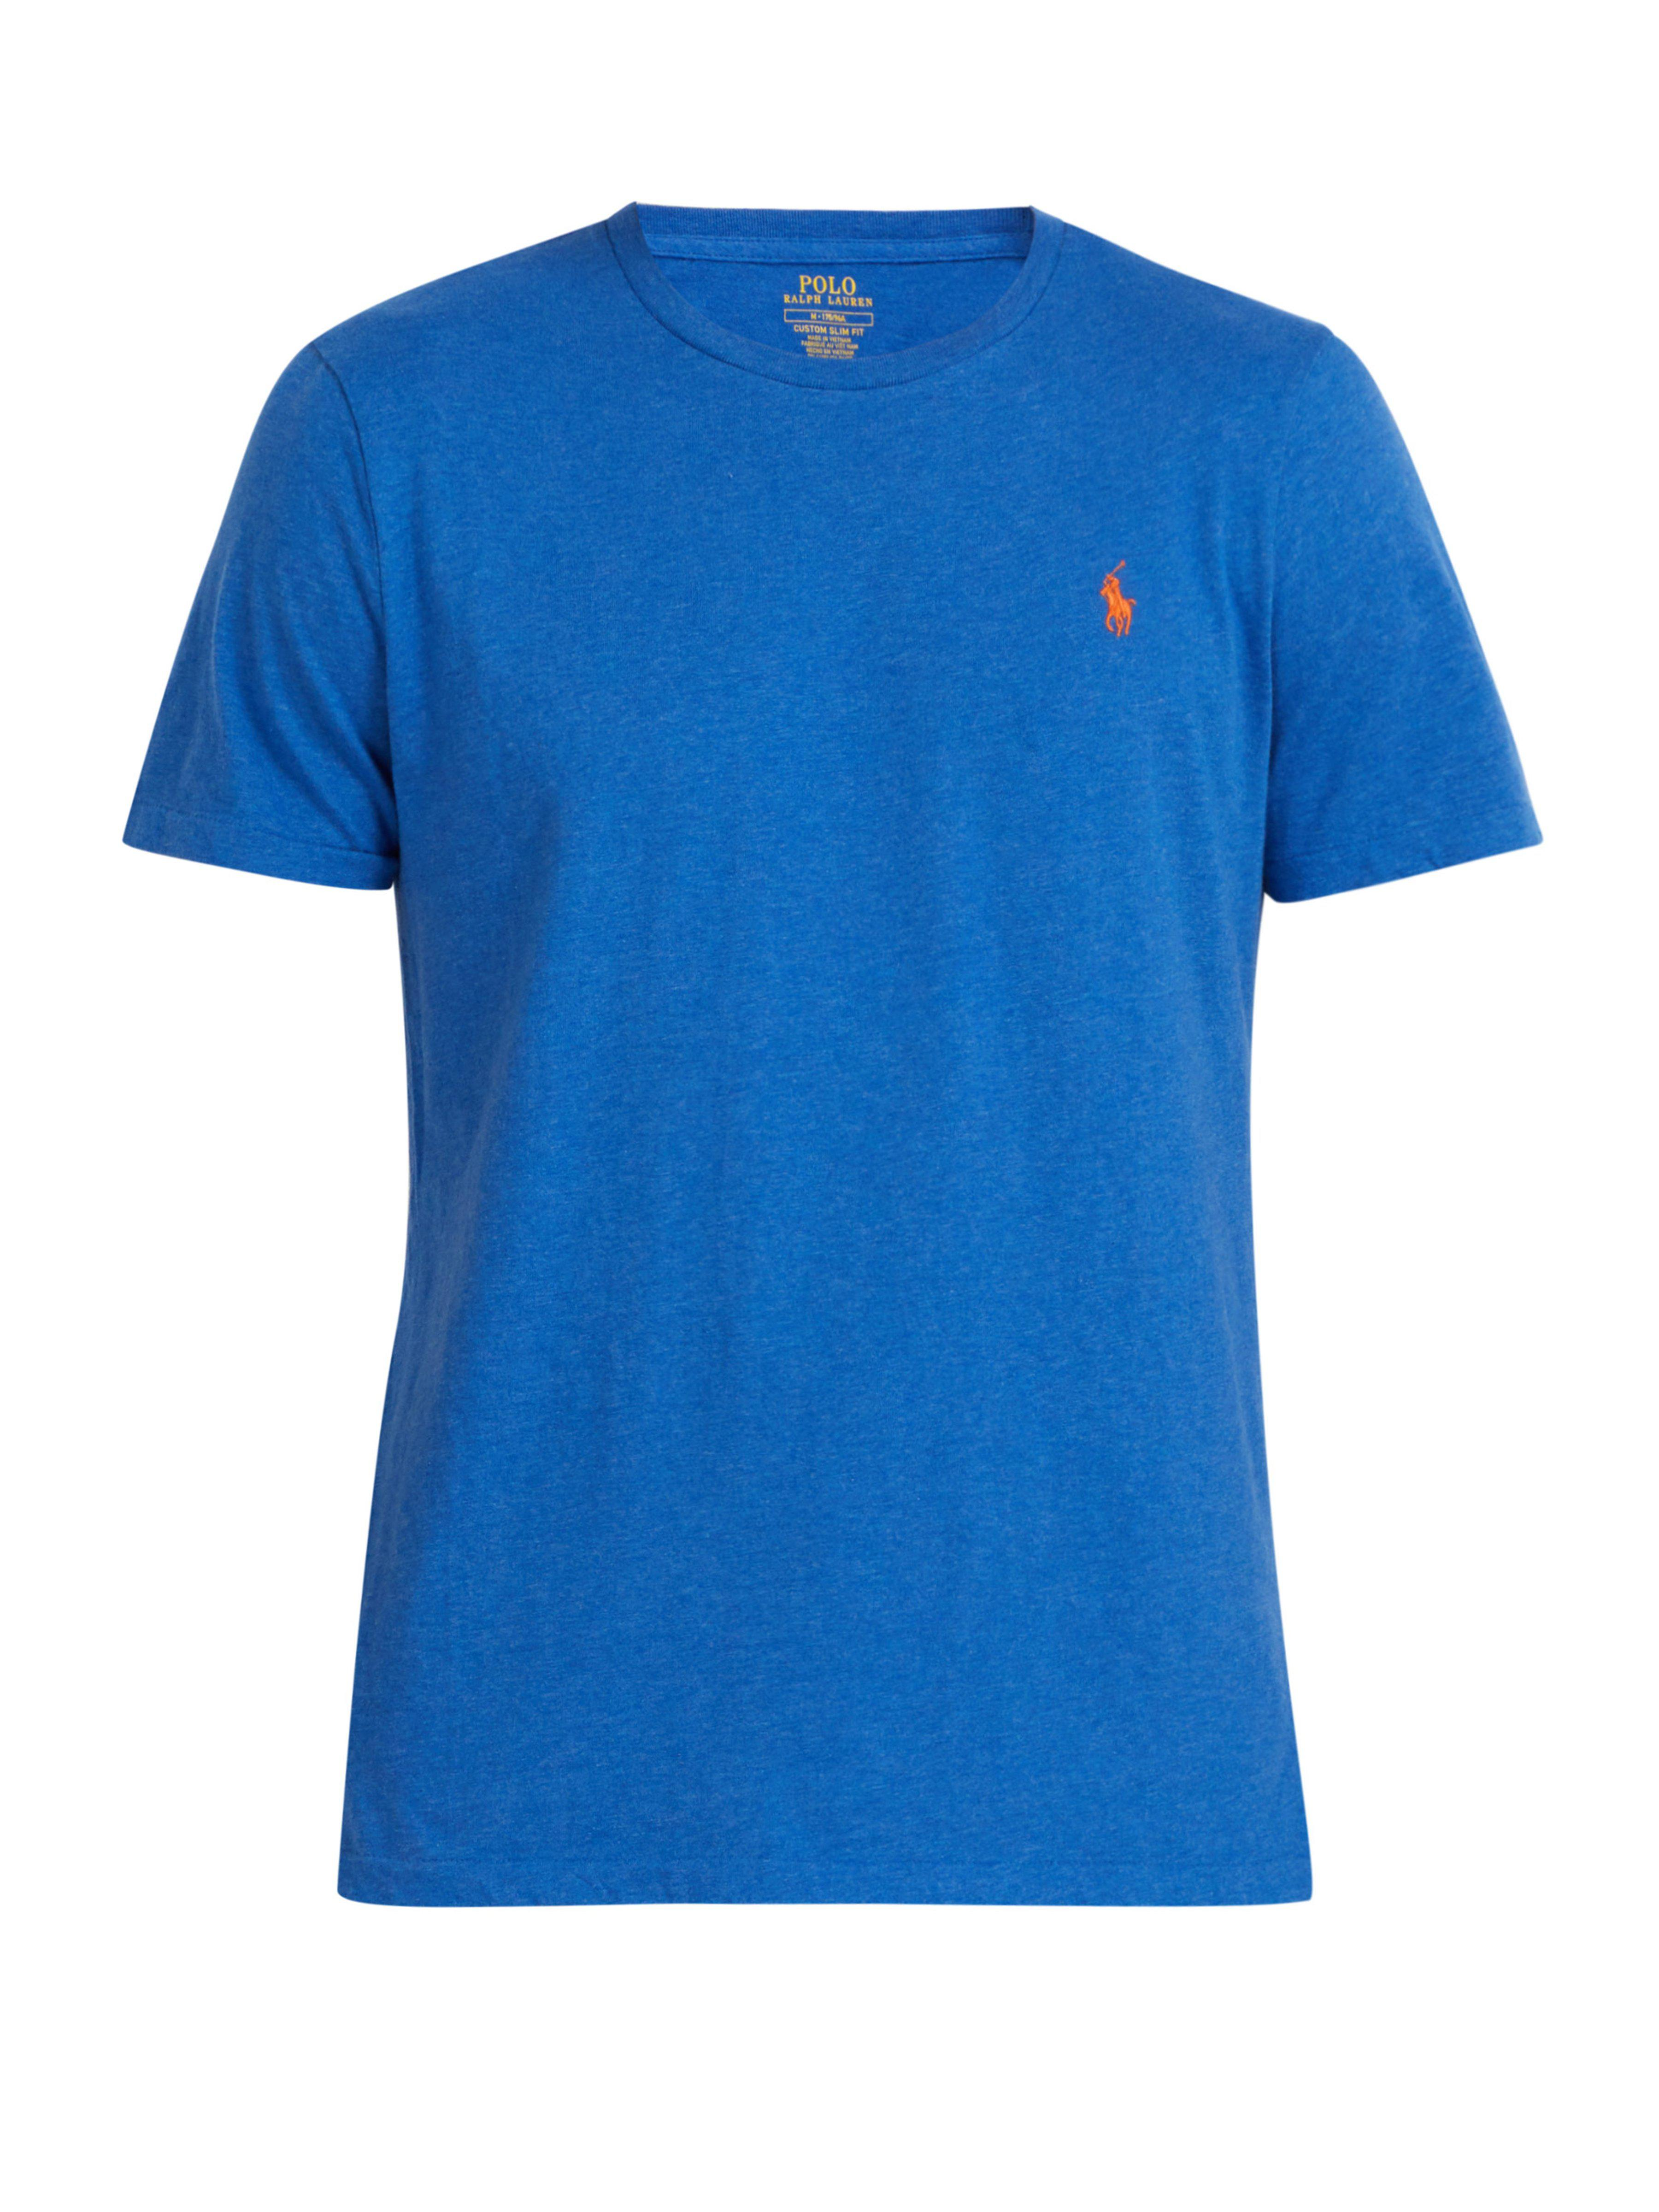 d88bd9ae2618b Polo Ralph Lauren - Blue Logo Embroidered Cotton Jersey T Shirt for Men -  Lyst. View fullscreen